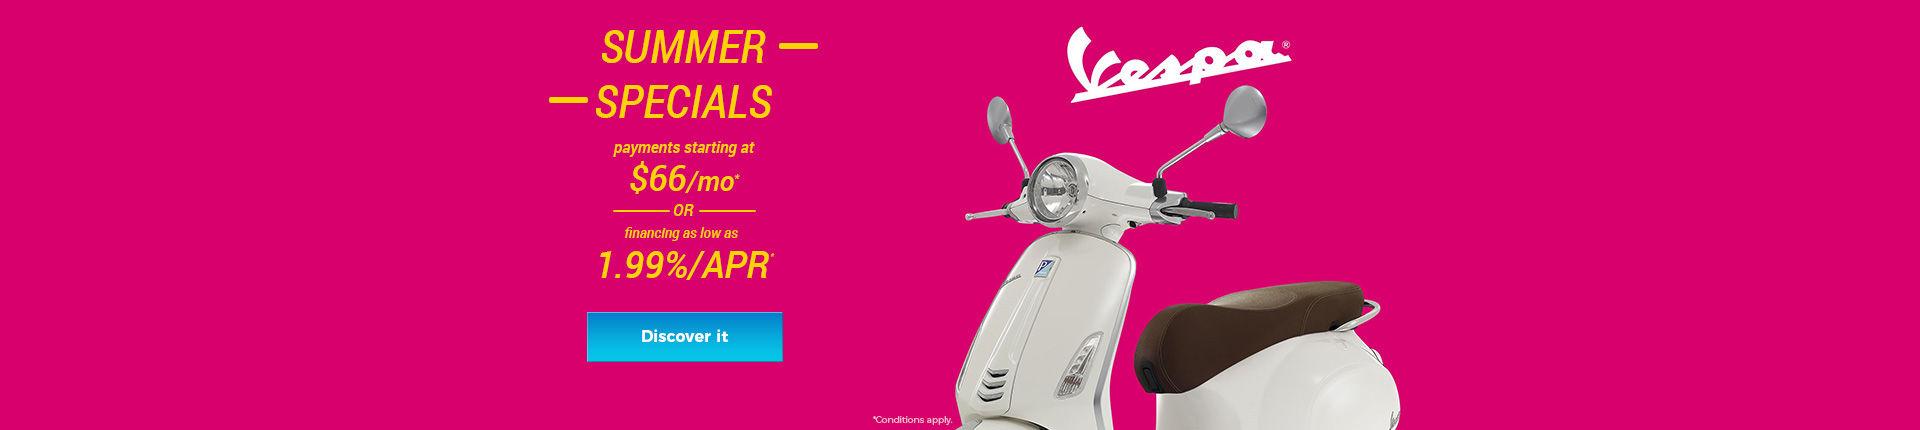 Vespa Summer Specials!